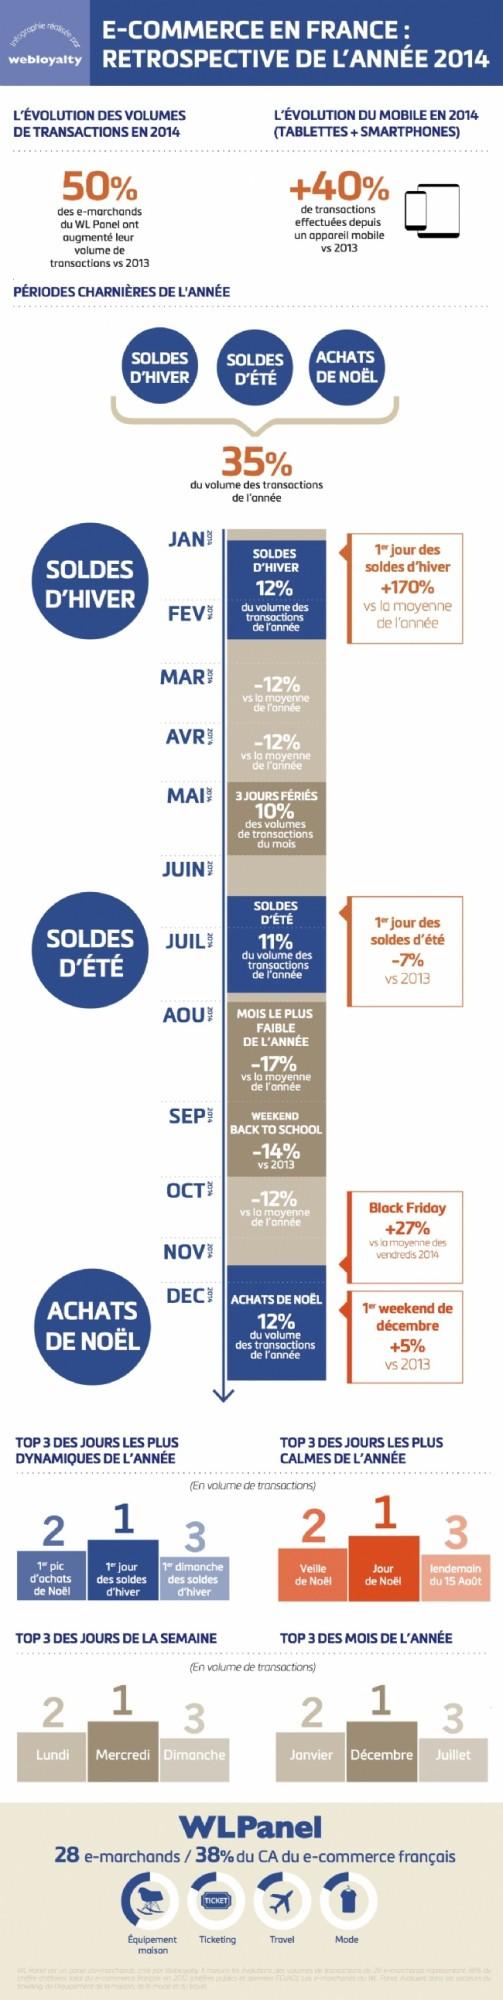 bilan-soldes-ecommerce-2014